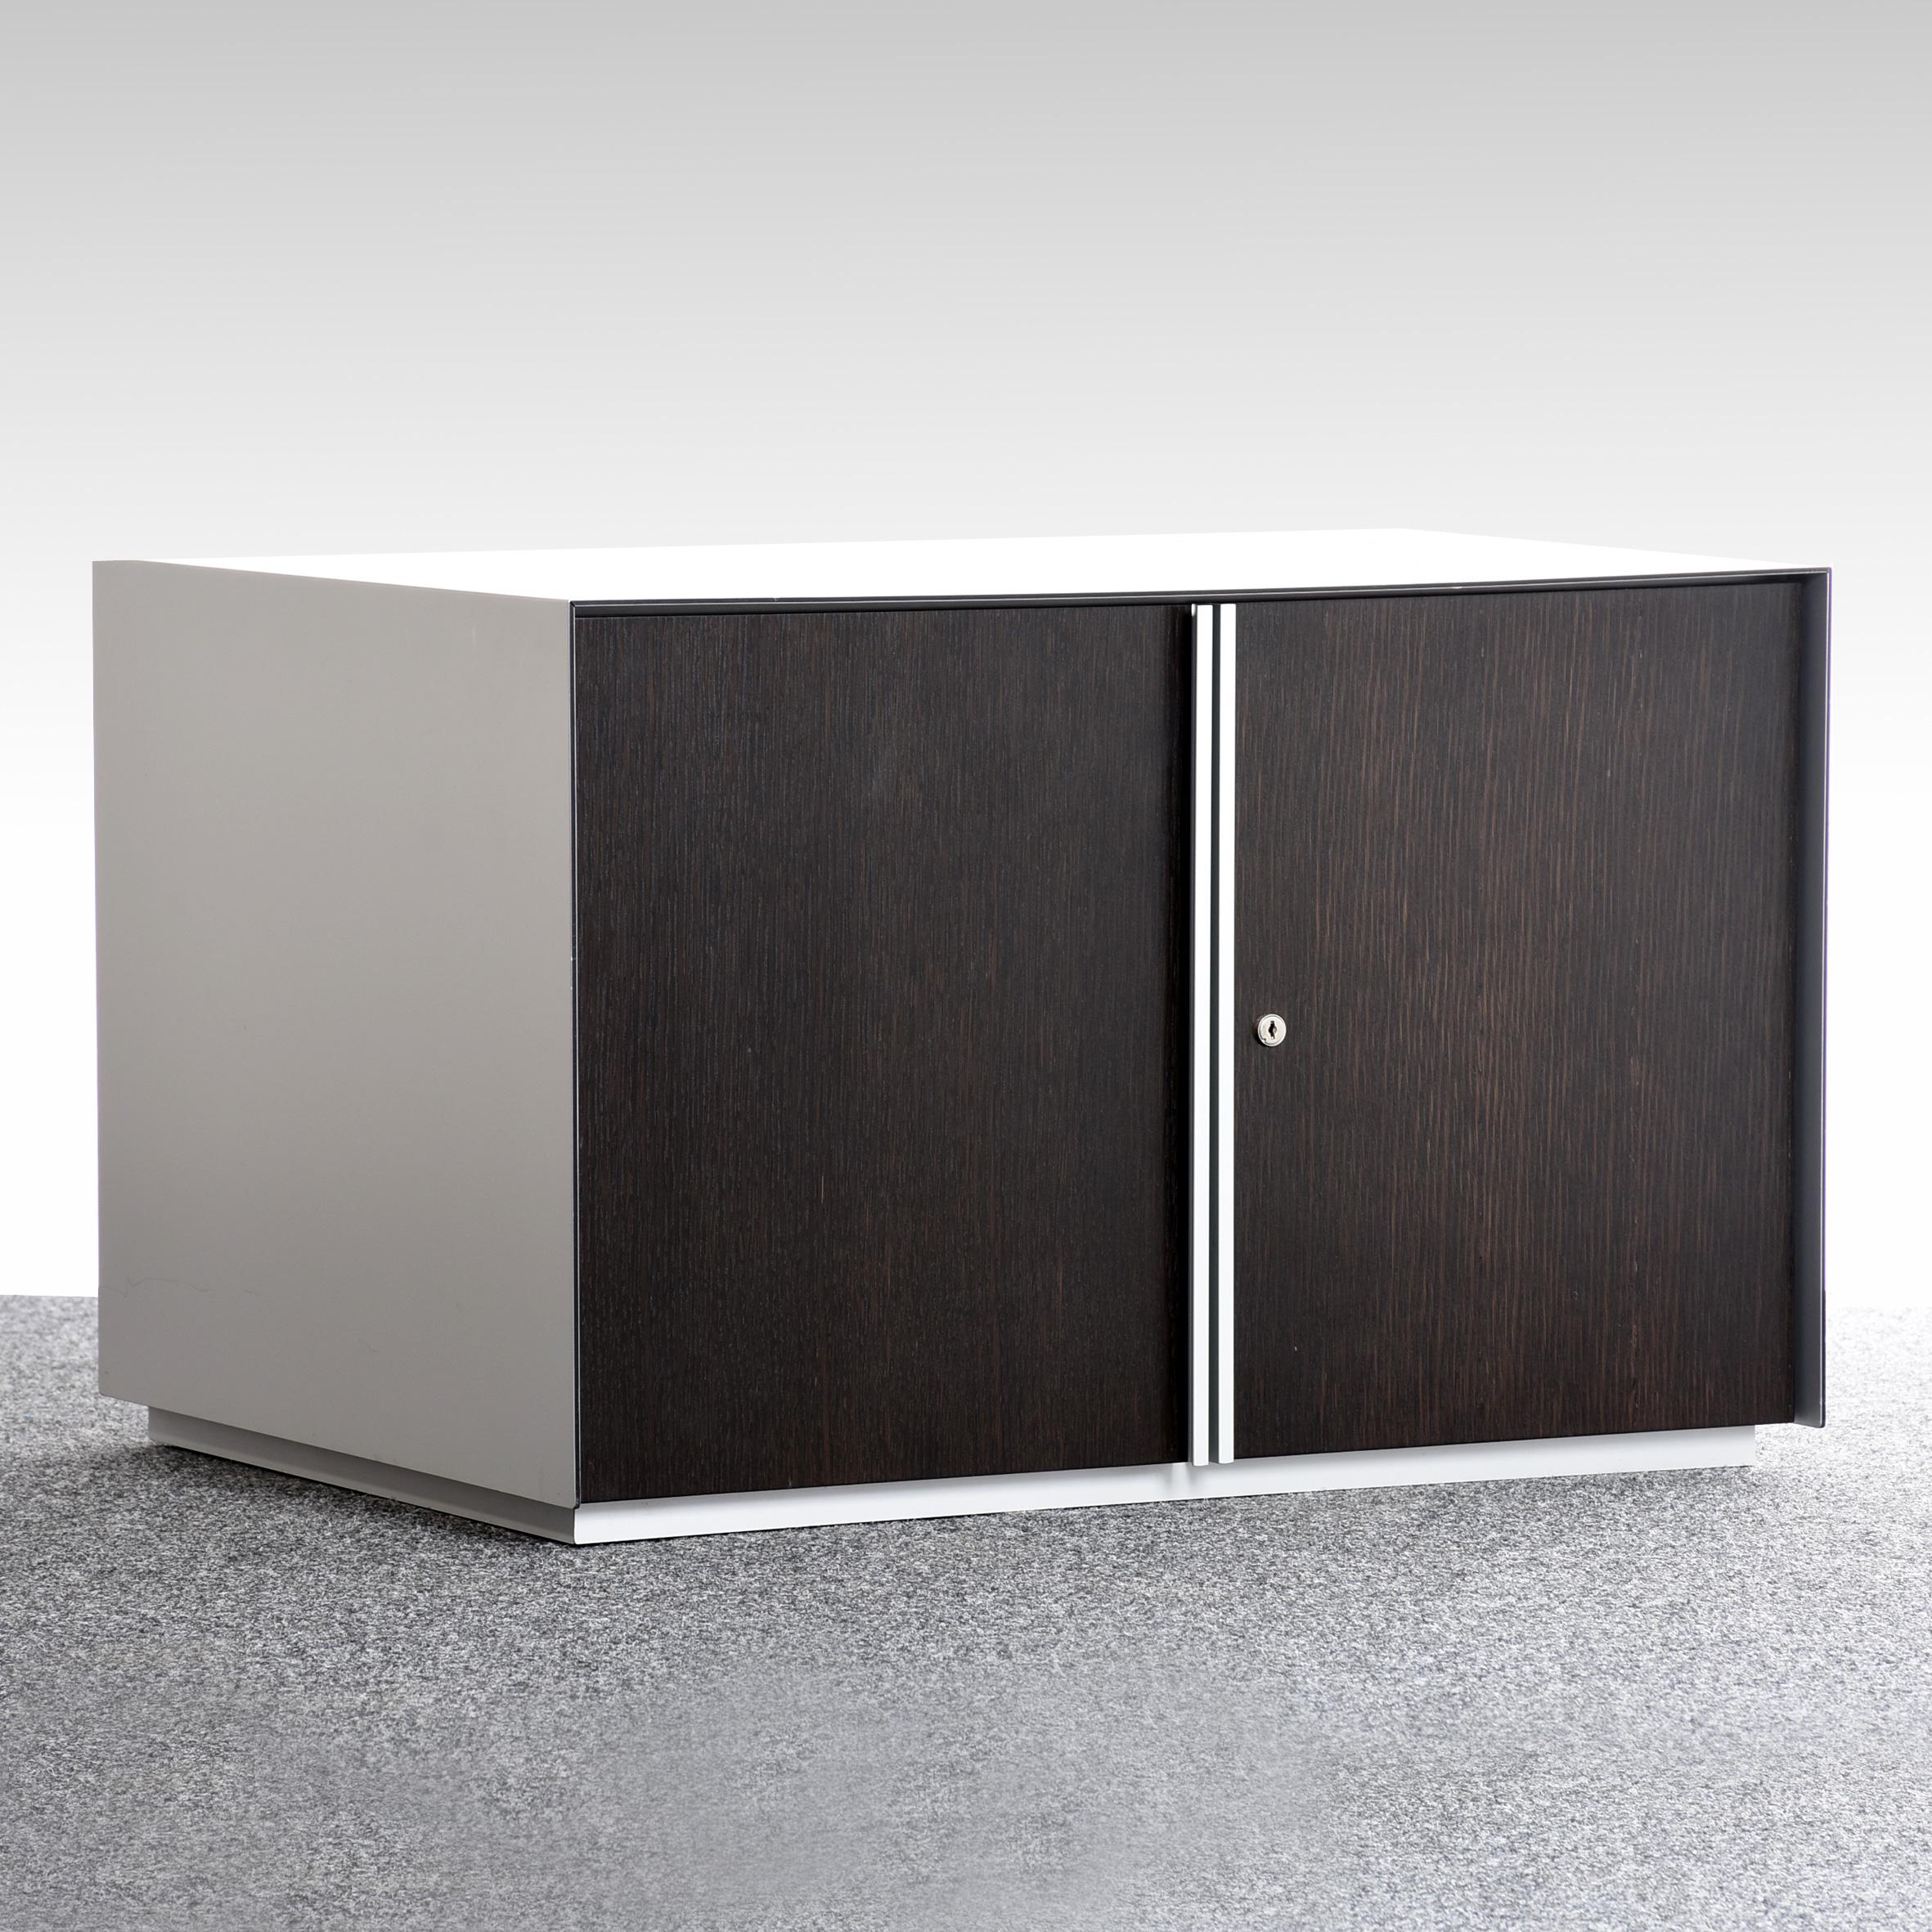 Büroschränke gebraucht | gruenebueromoebel.de - Gebraucht, gut, günstig